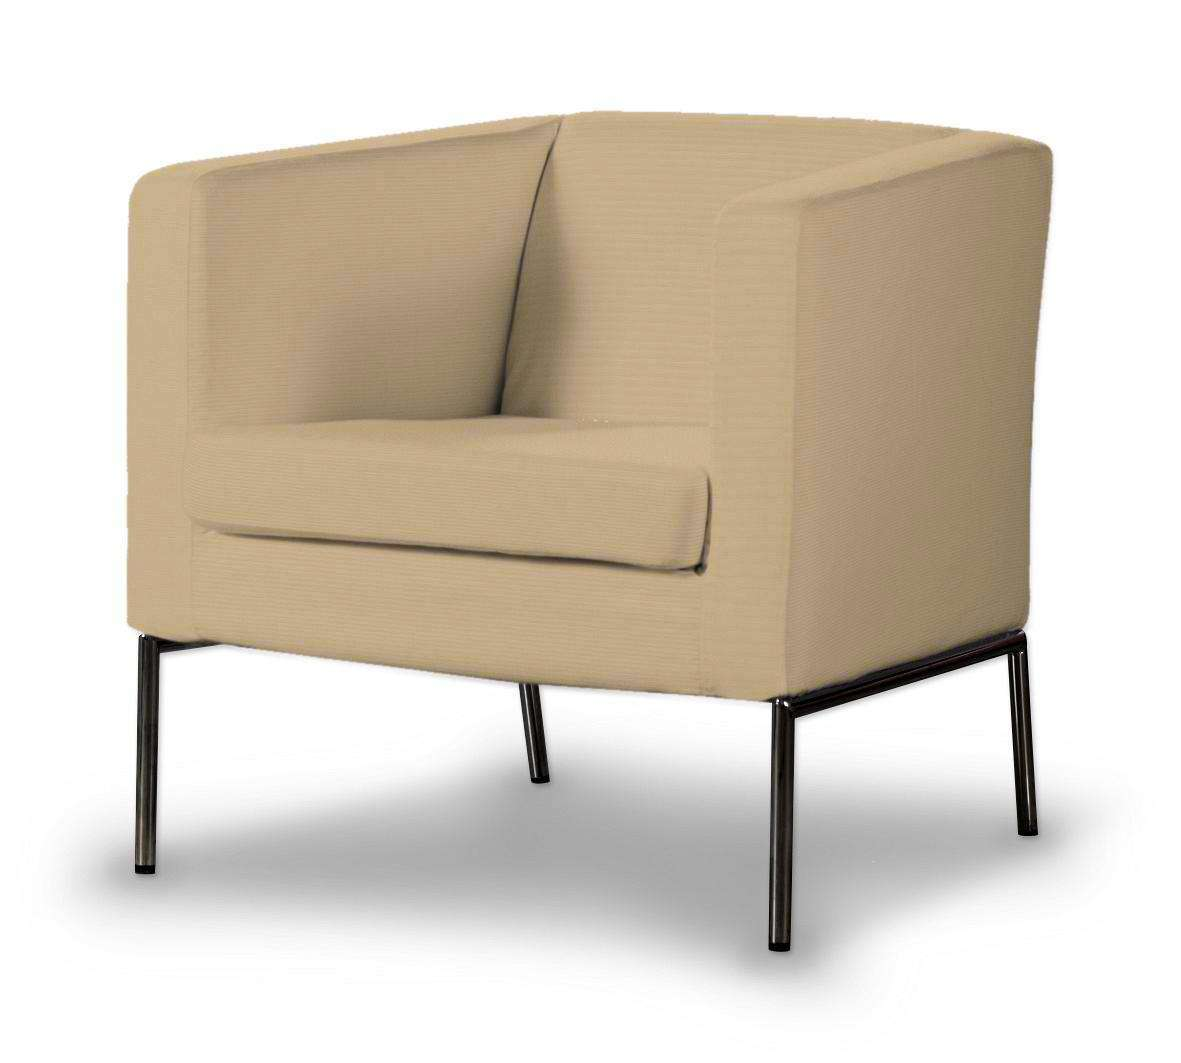 Klappsta betræk lænestol fra kollektionen Cotton Panama, Stof: 702-01